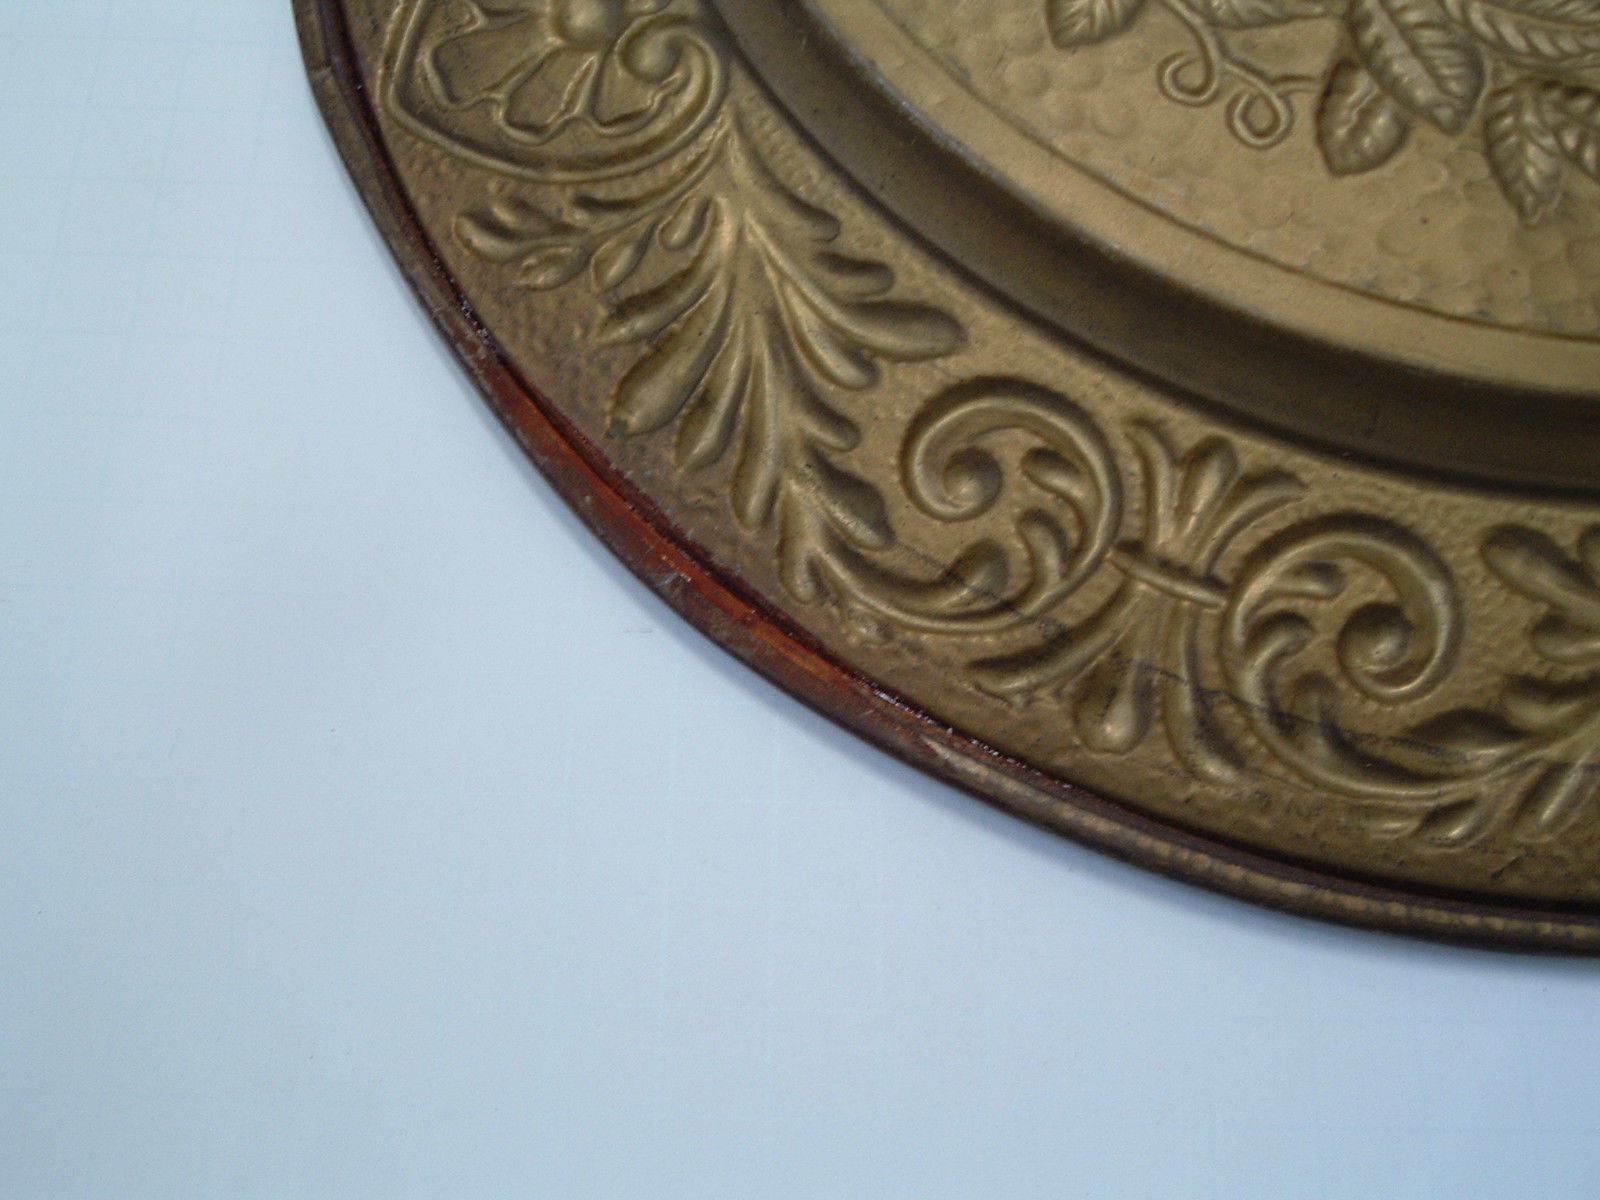 Vintage Round Metal Gold Embossed Stamped Fruit Decor